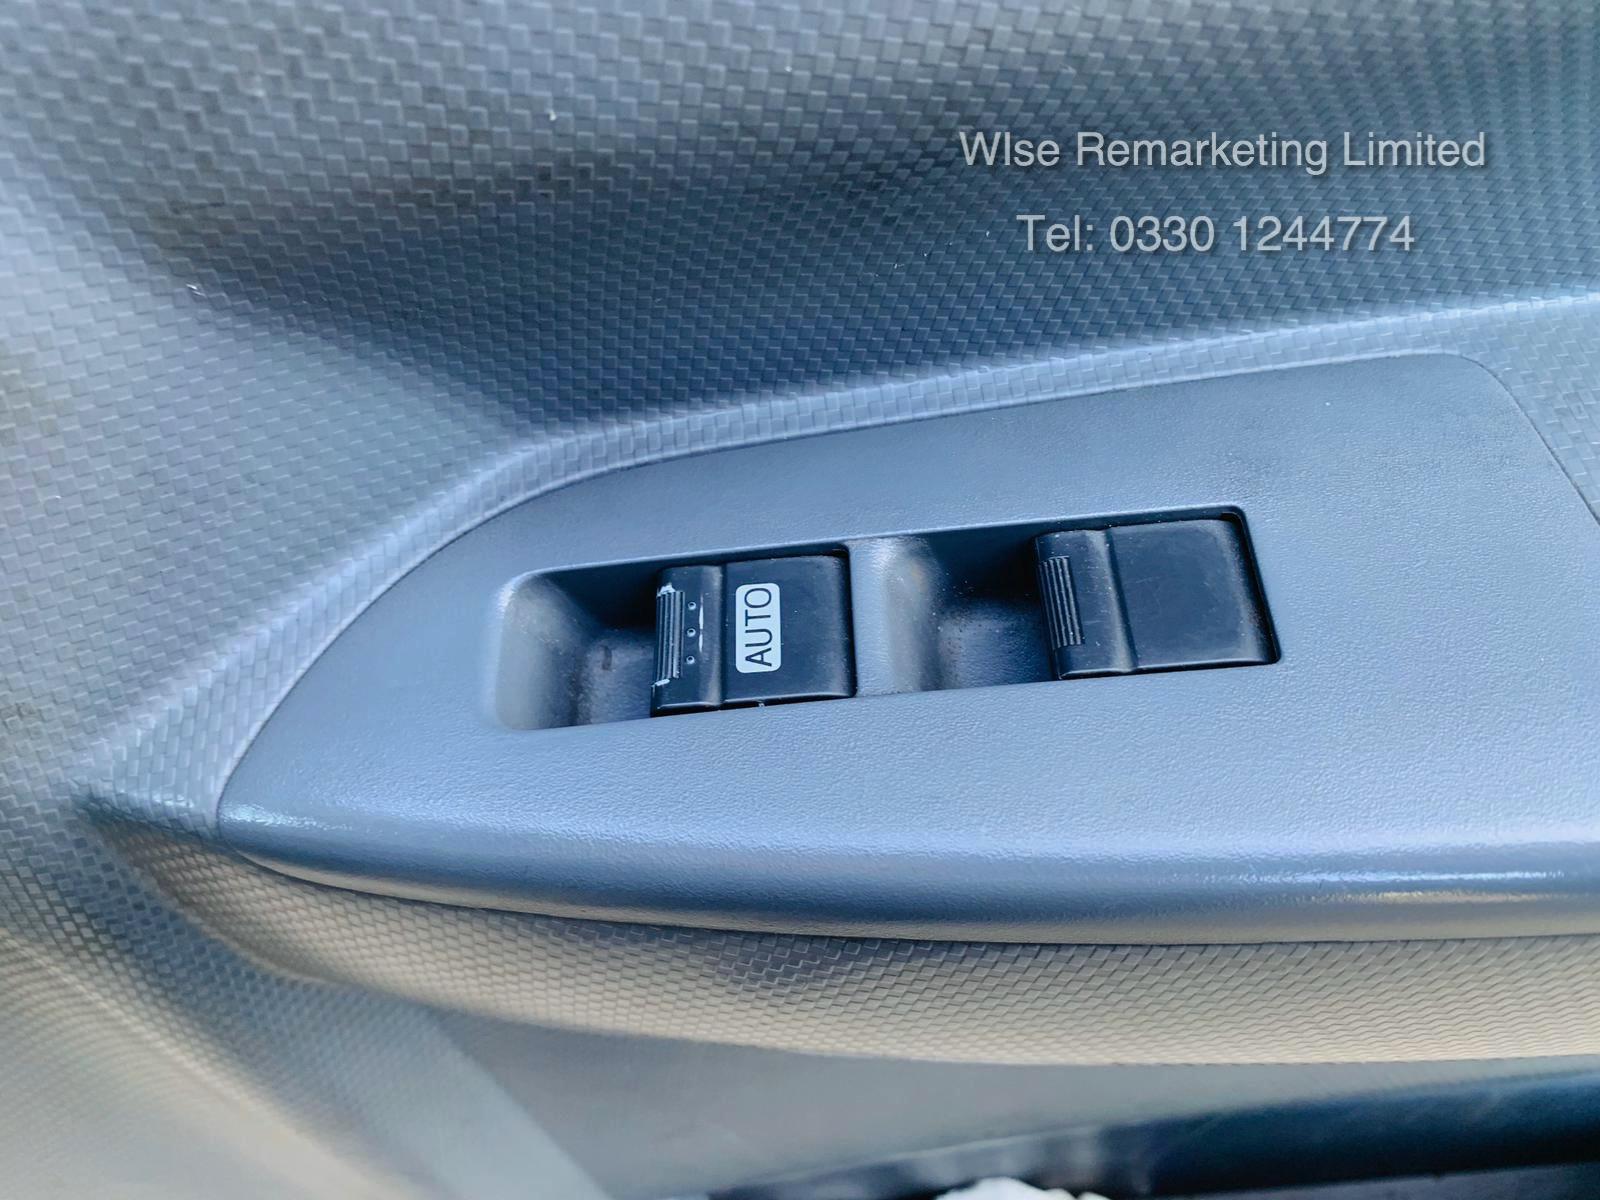 (RESERVE MET) Isuzu N75.190 NPR Automatic 16ft Curtainsider - 2013 Model - 1 Owner - Long MOT - Image 18 of 20